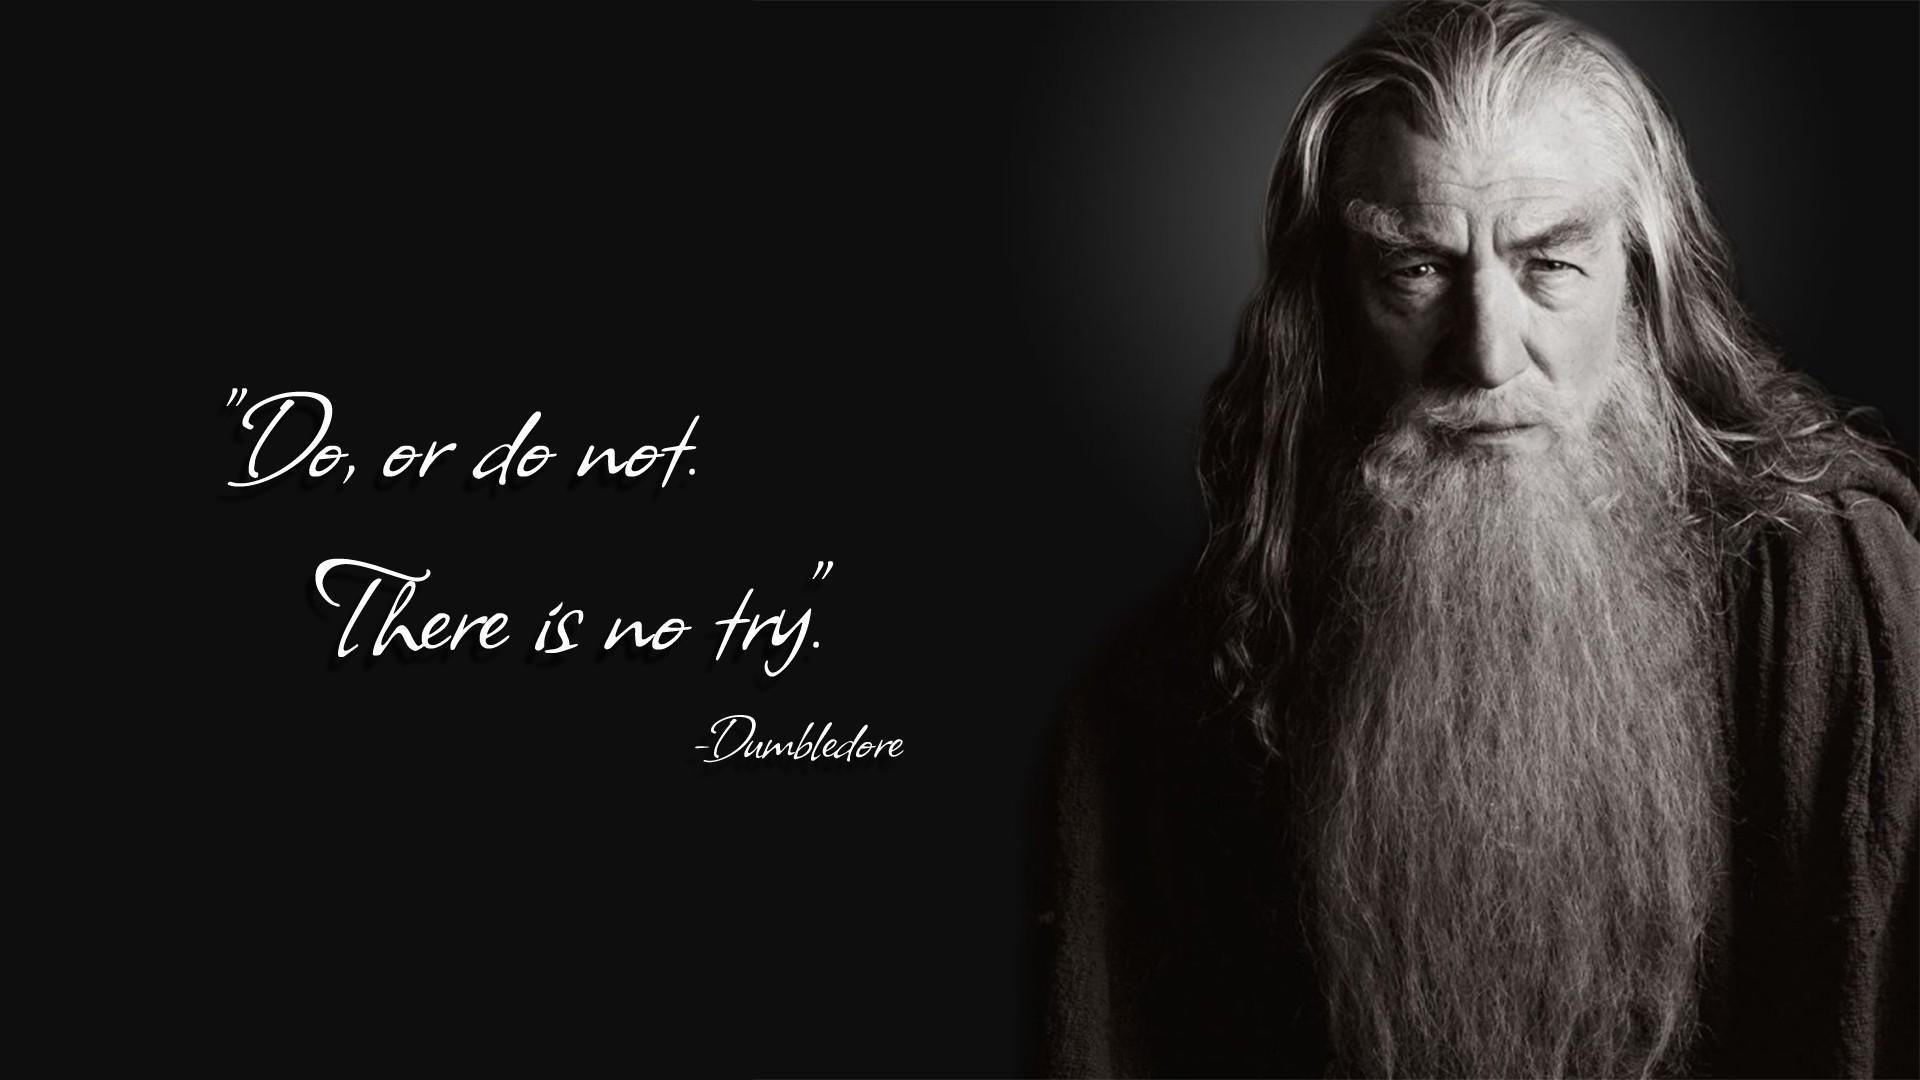 Most Inspiring Wallpaper Harry Potter Love - e5f9e617cce8bd0e073959ab638c24a1  Image_276894.jpg